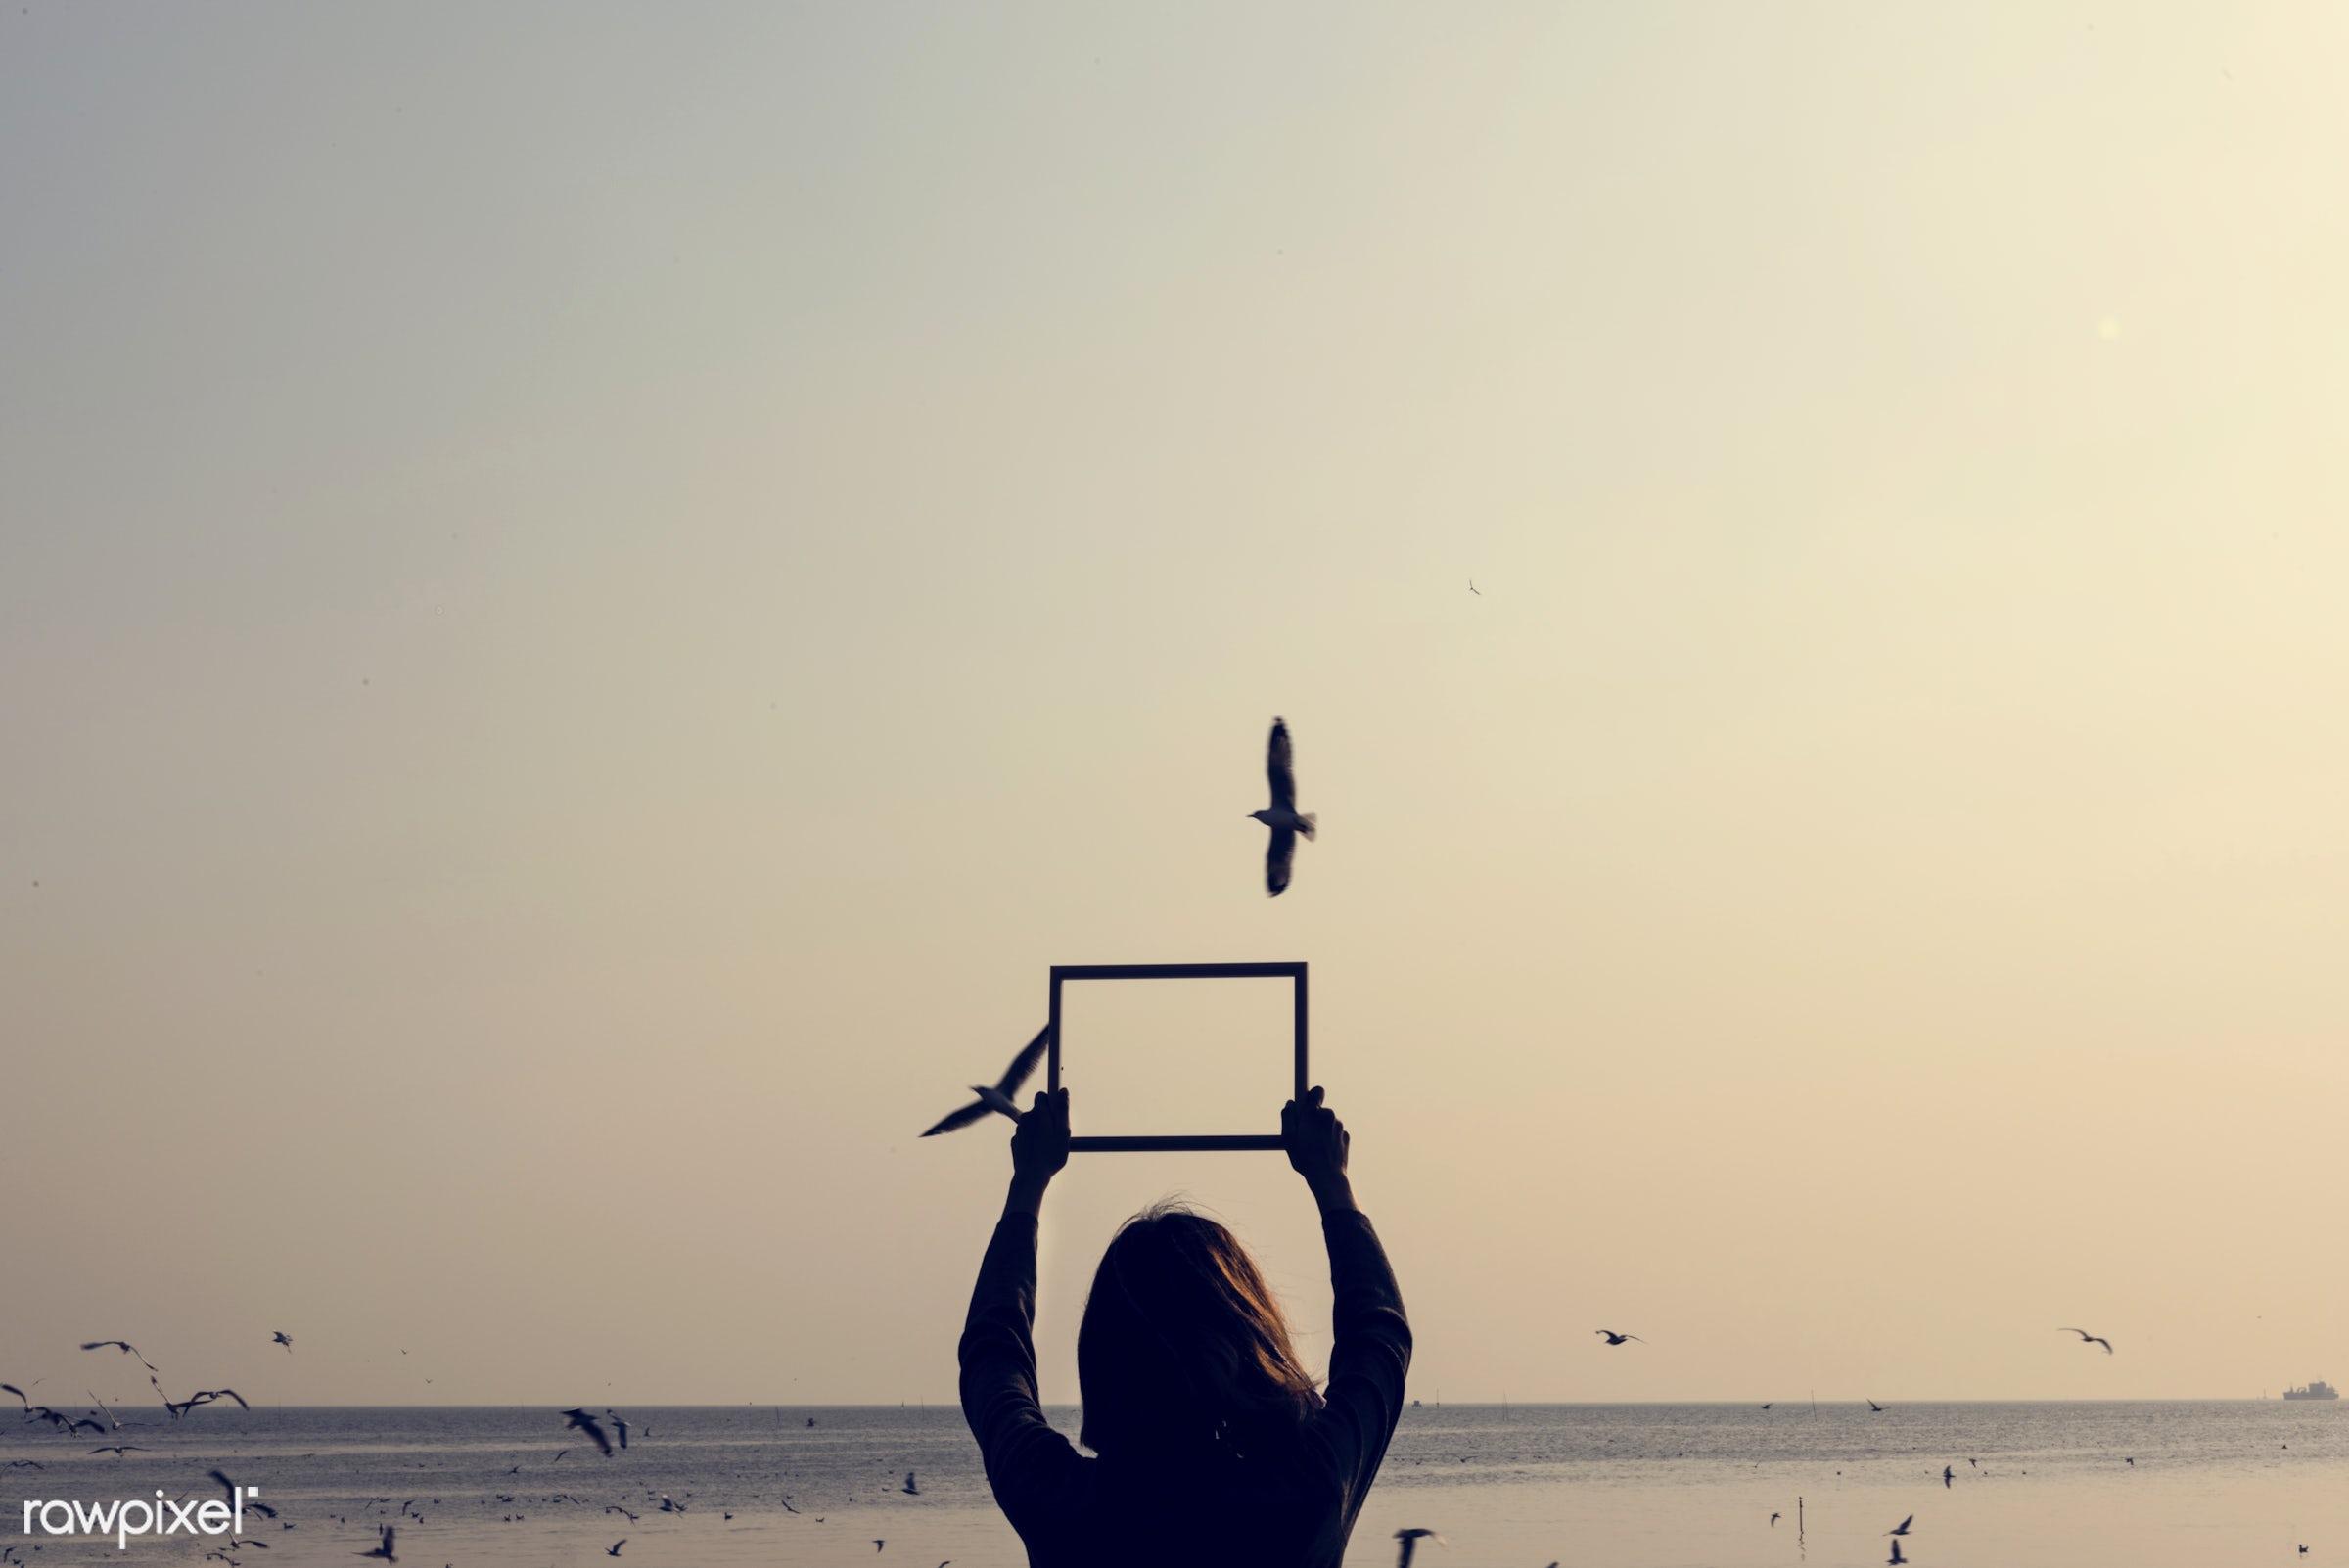 border, bird, empty, fly, frame, girl, holding, migration, nature, ocean, outdoors, person, rectangular, sea, shape, sky,...